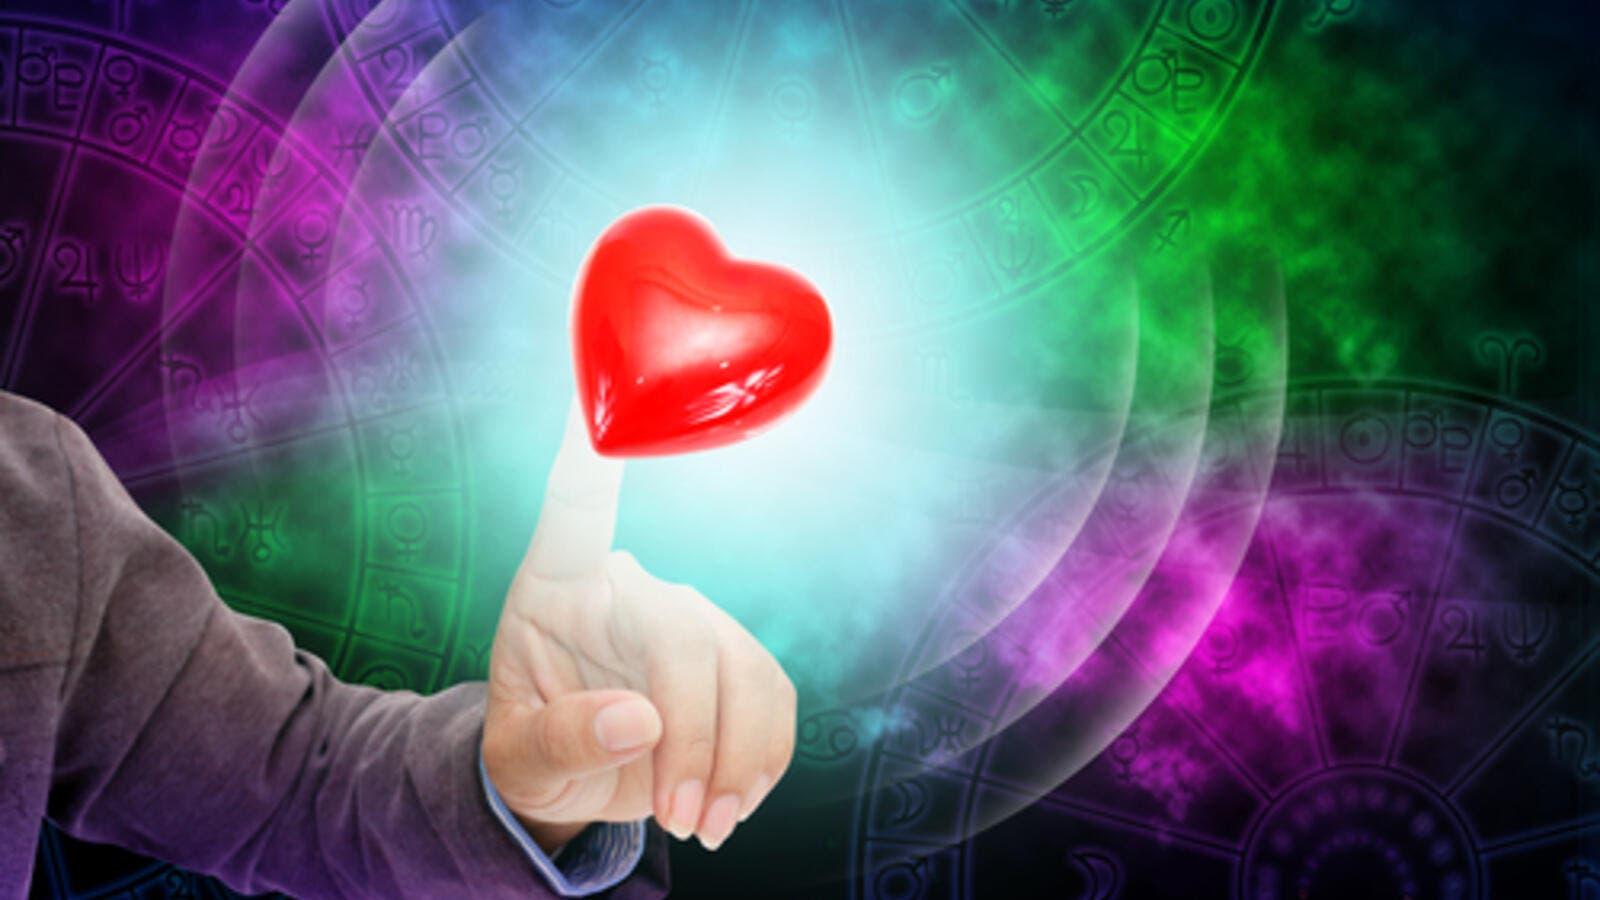 b5ce3ff96b3c5 الحب والعلاقة العاطفية لكل برج بشكل منفصل